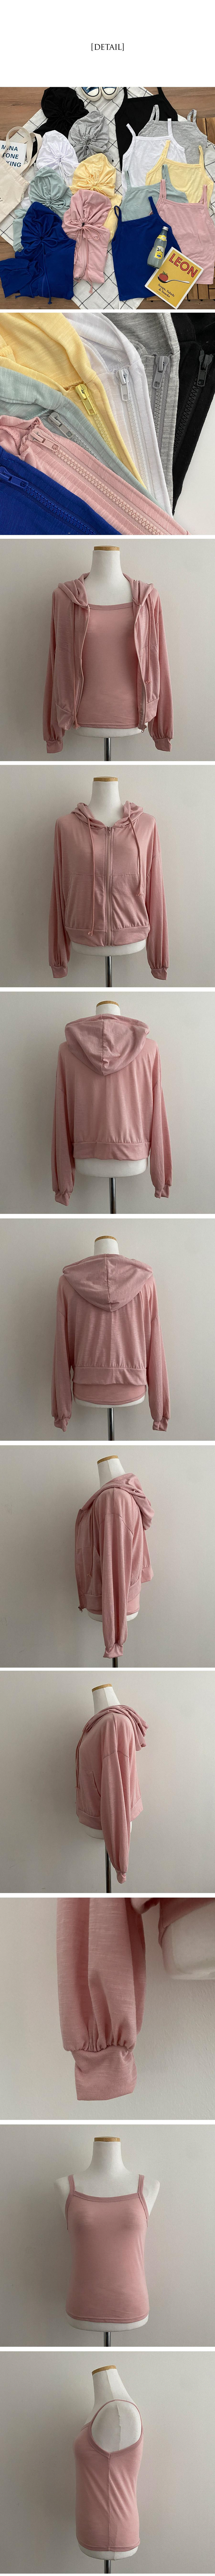 Thin and Light Slab Hood Zip-Up Sleeveless Two-Piece Set